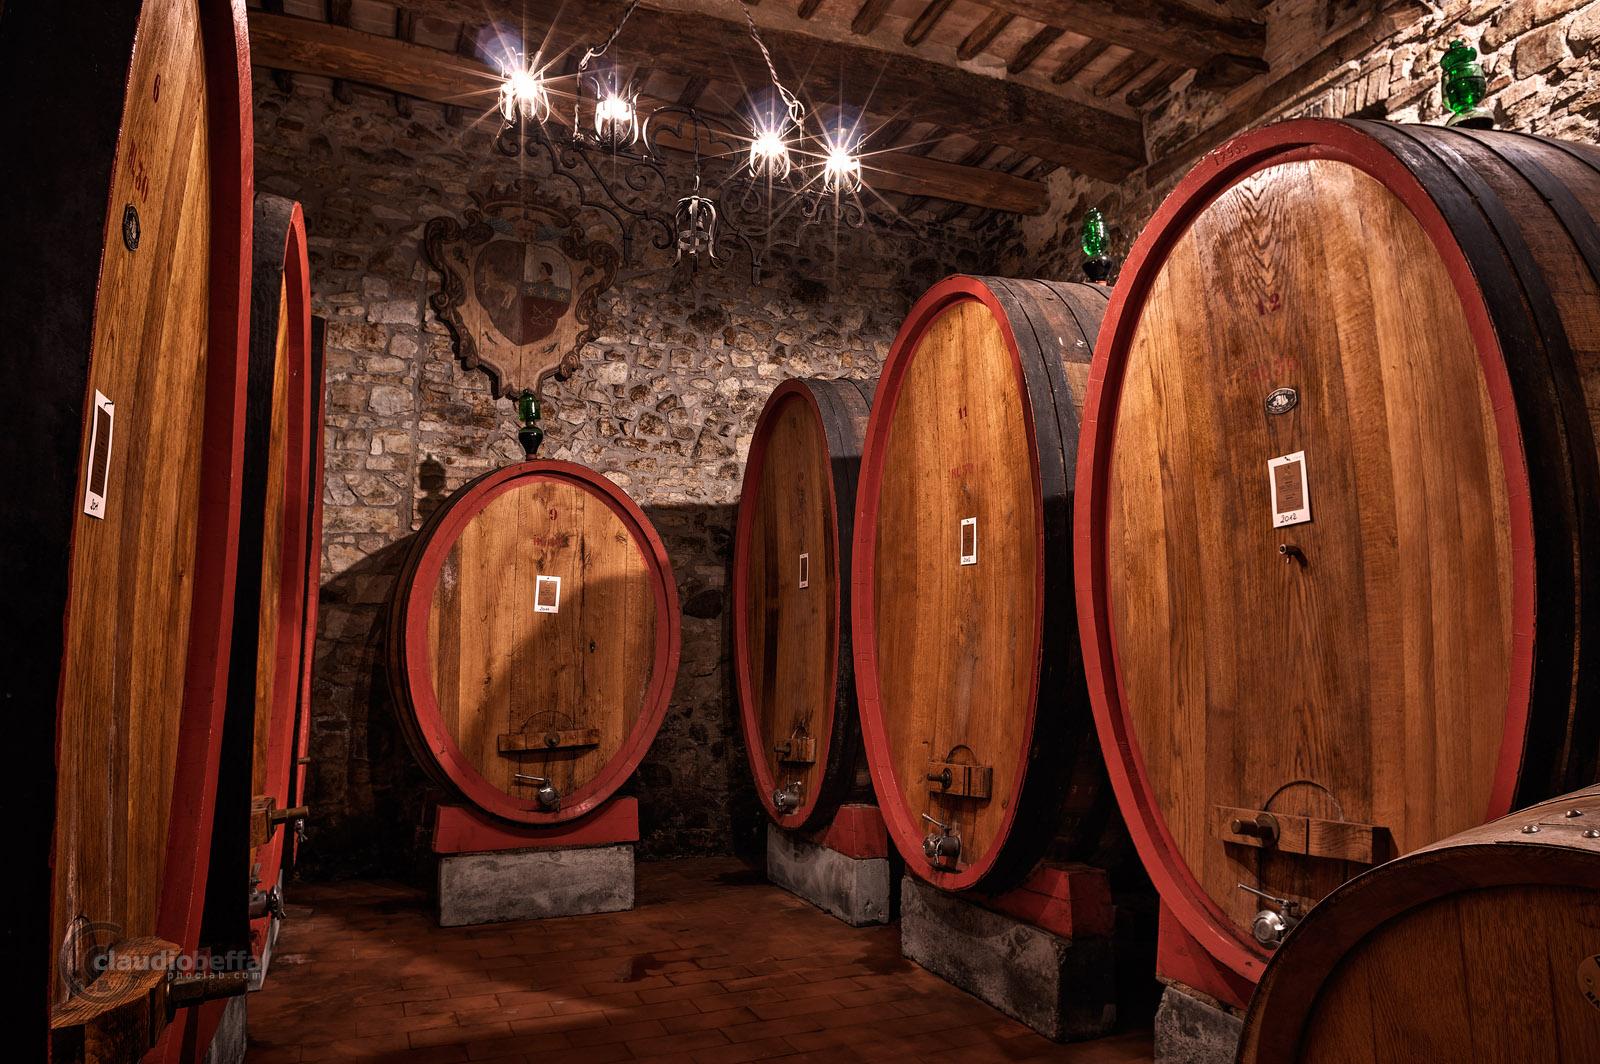 Cellar, Casks, Ancient, Wine, Wine-making, Costanti, Tuscany, Toscana, Val d'Orcia, Montalcino, Italy, Italia, gathering